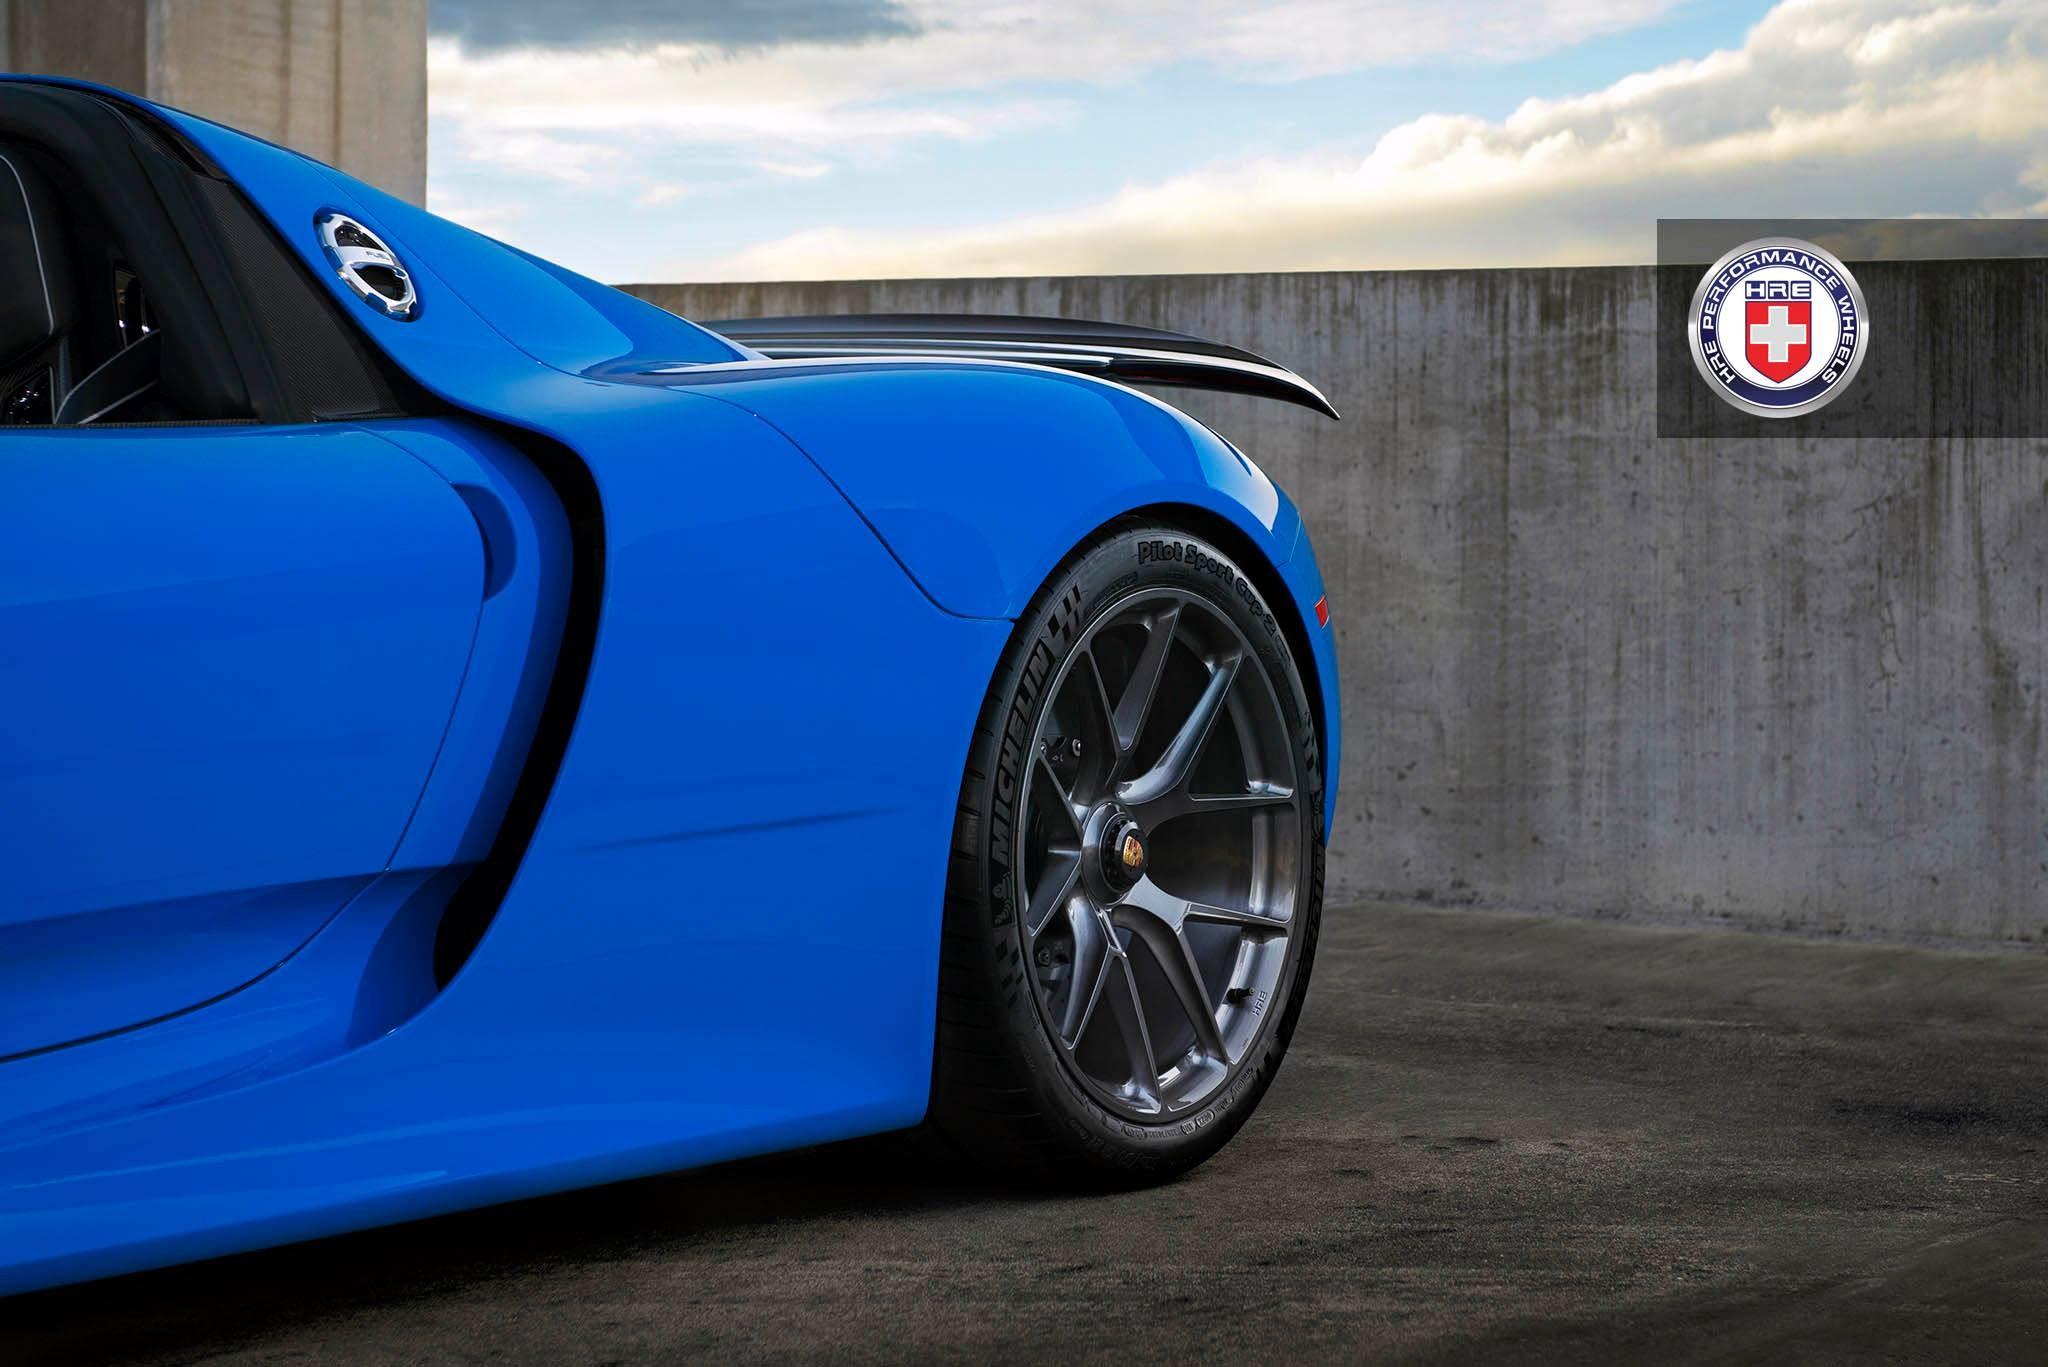 car-vehicle-sports-car-German-cars-performance-car-Porsche-918-Spyder-HRE-Performance-Wheels-wheel-supercar-land-vehicle-automotive-design-automobile-make-47773 Interesting Hinh Anh Xe Porsche 918 Spyder Cars Trend